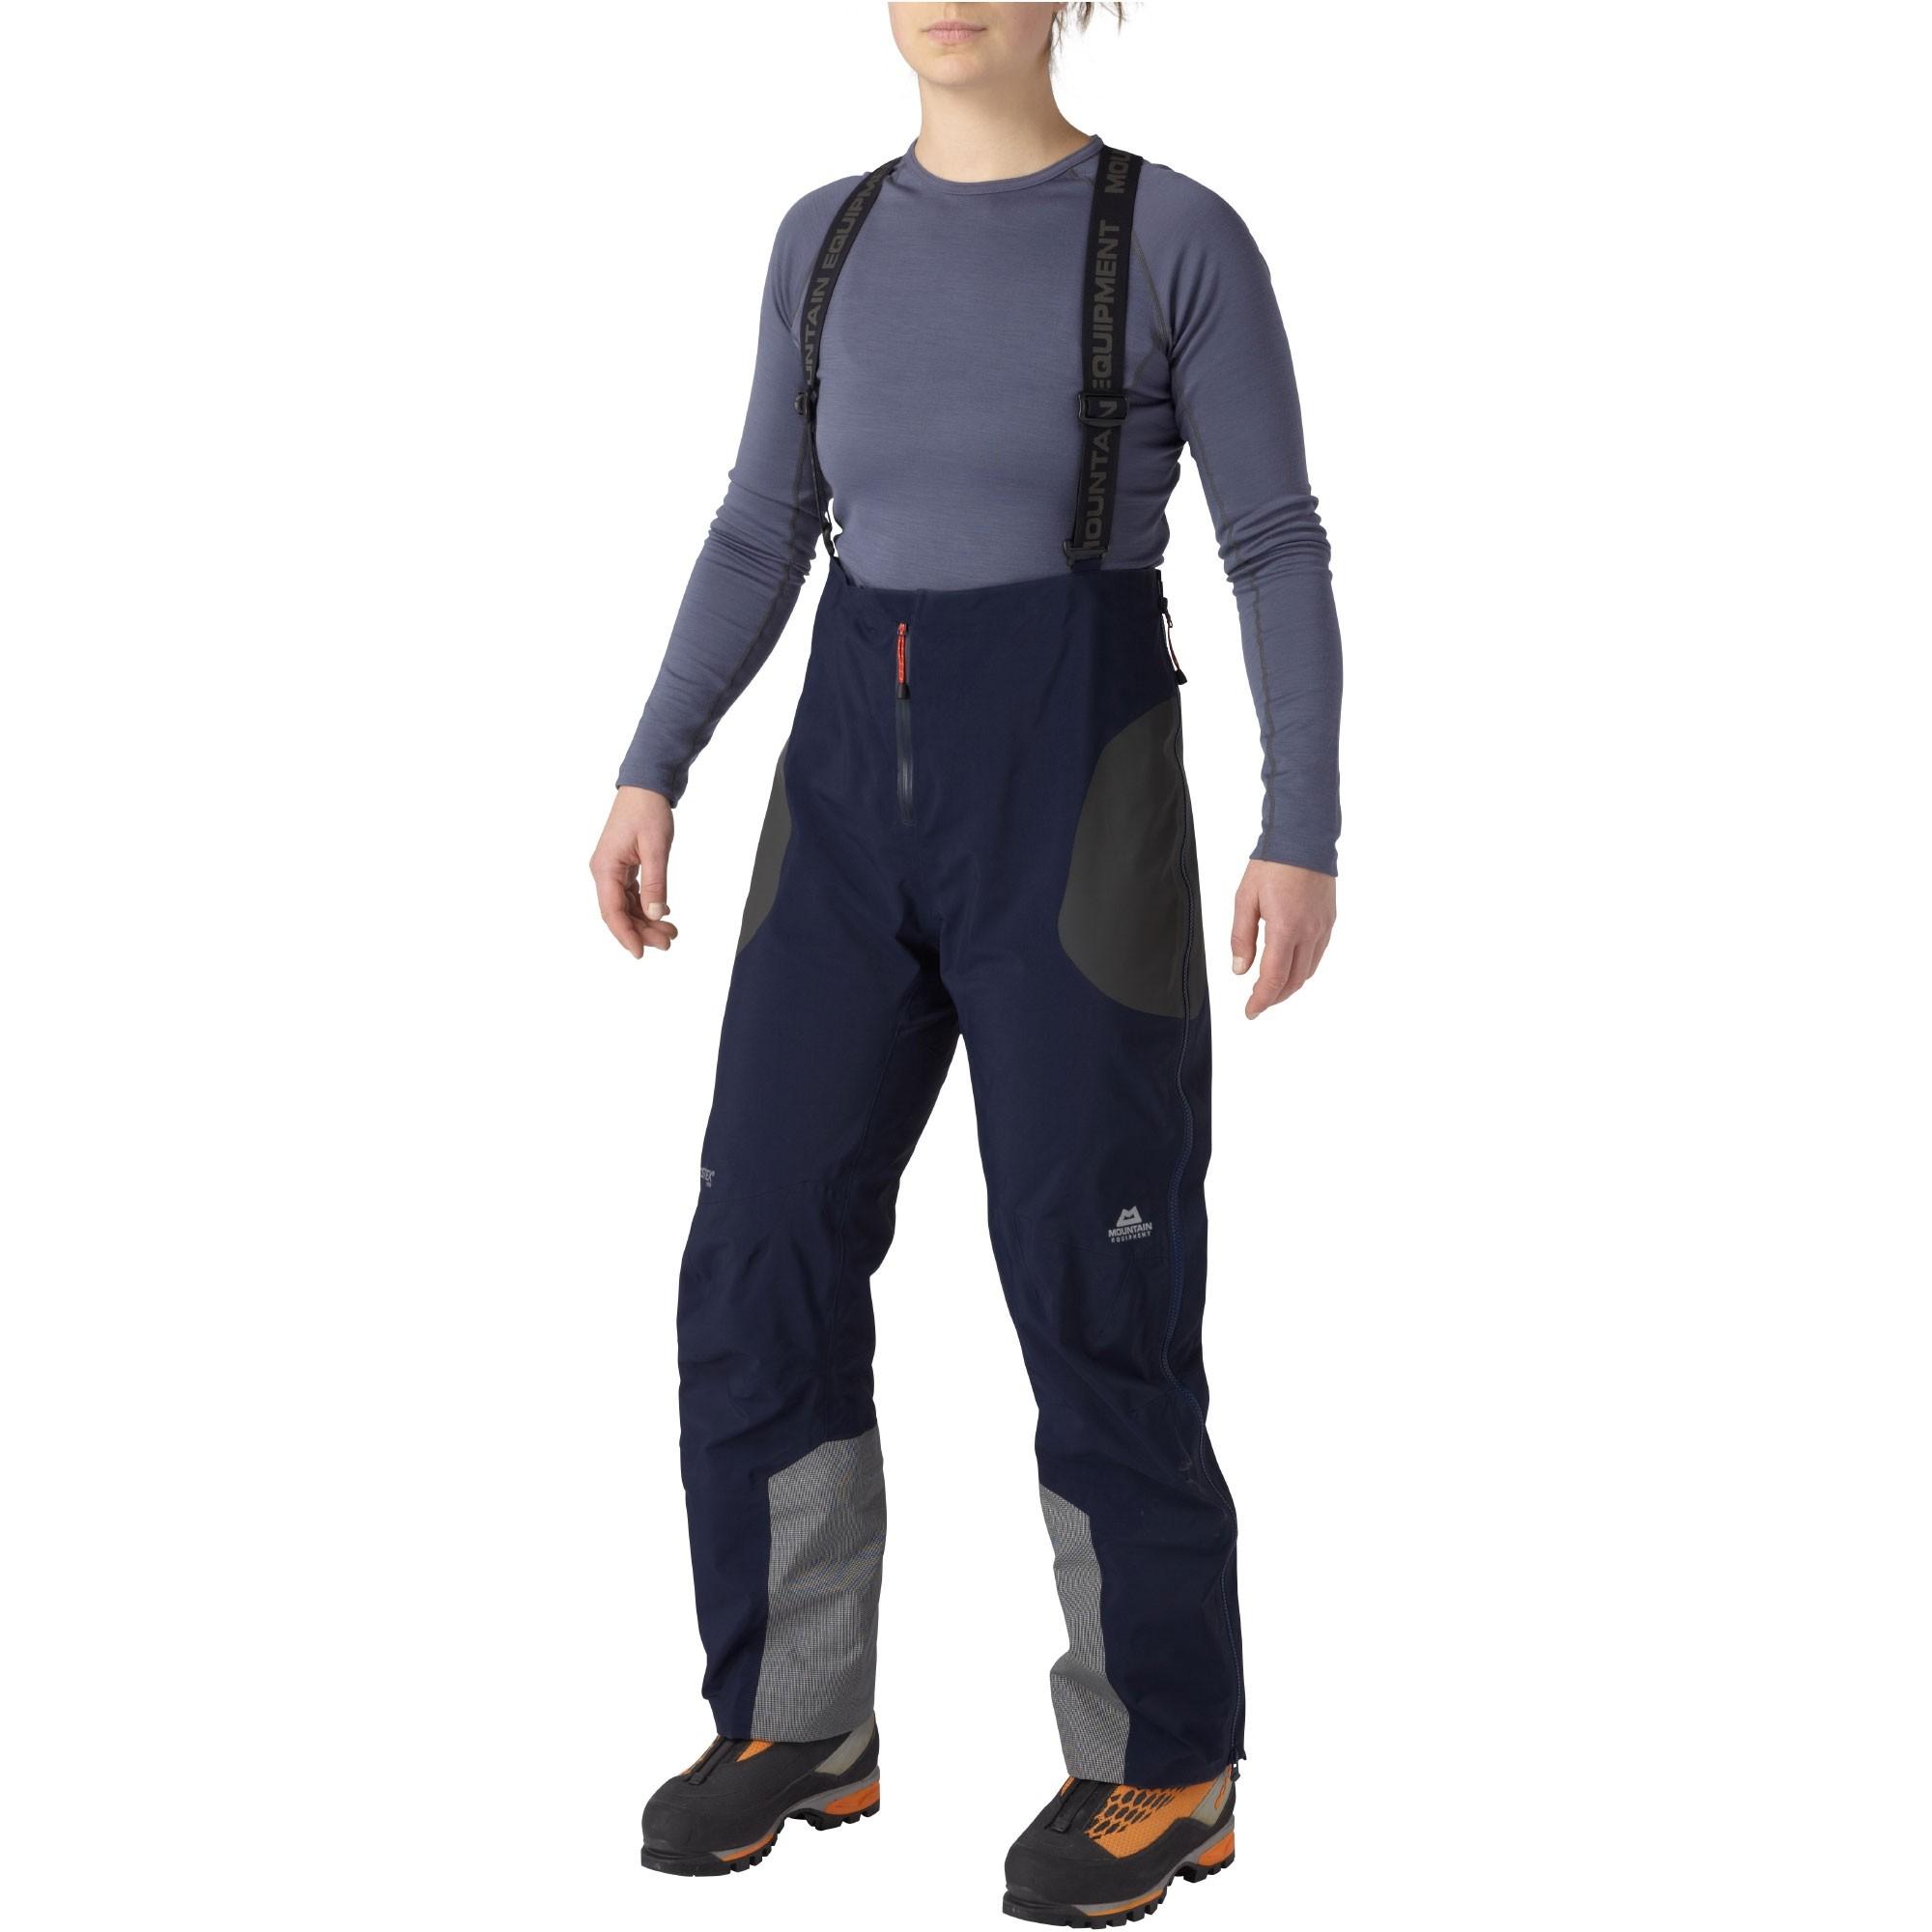 Mountain Equipment Manaslu Women's Pants - Cosmos - front